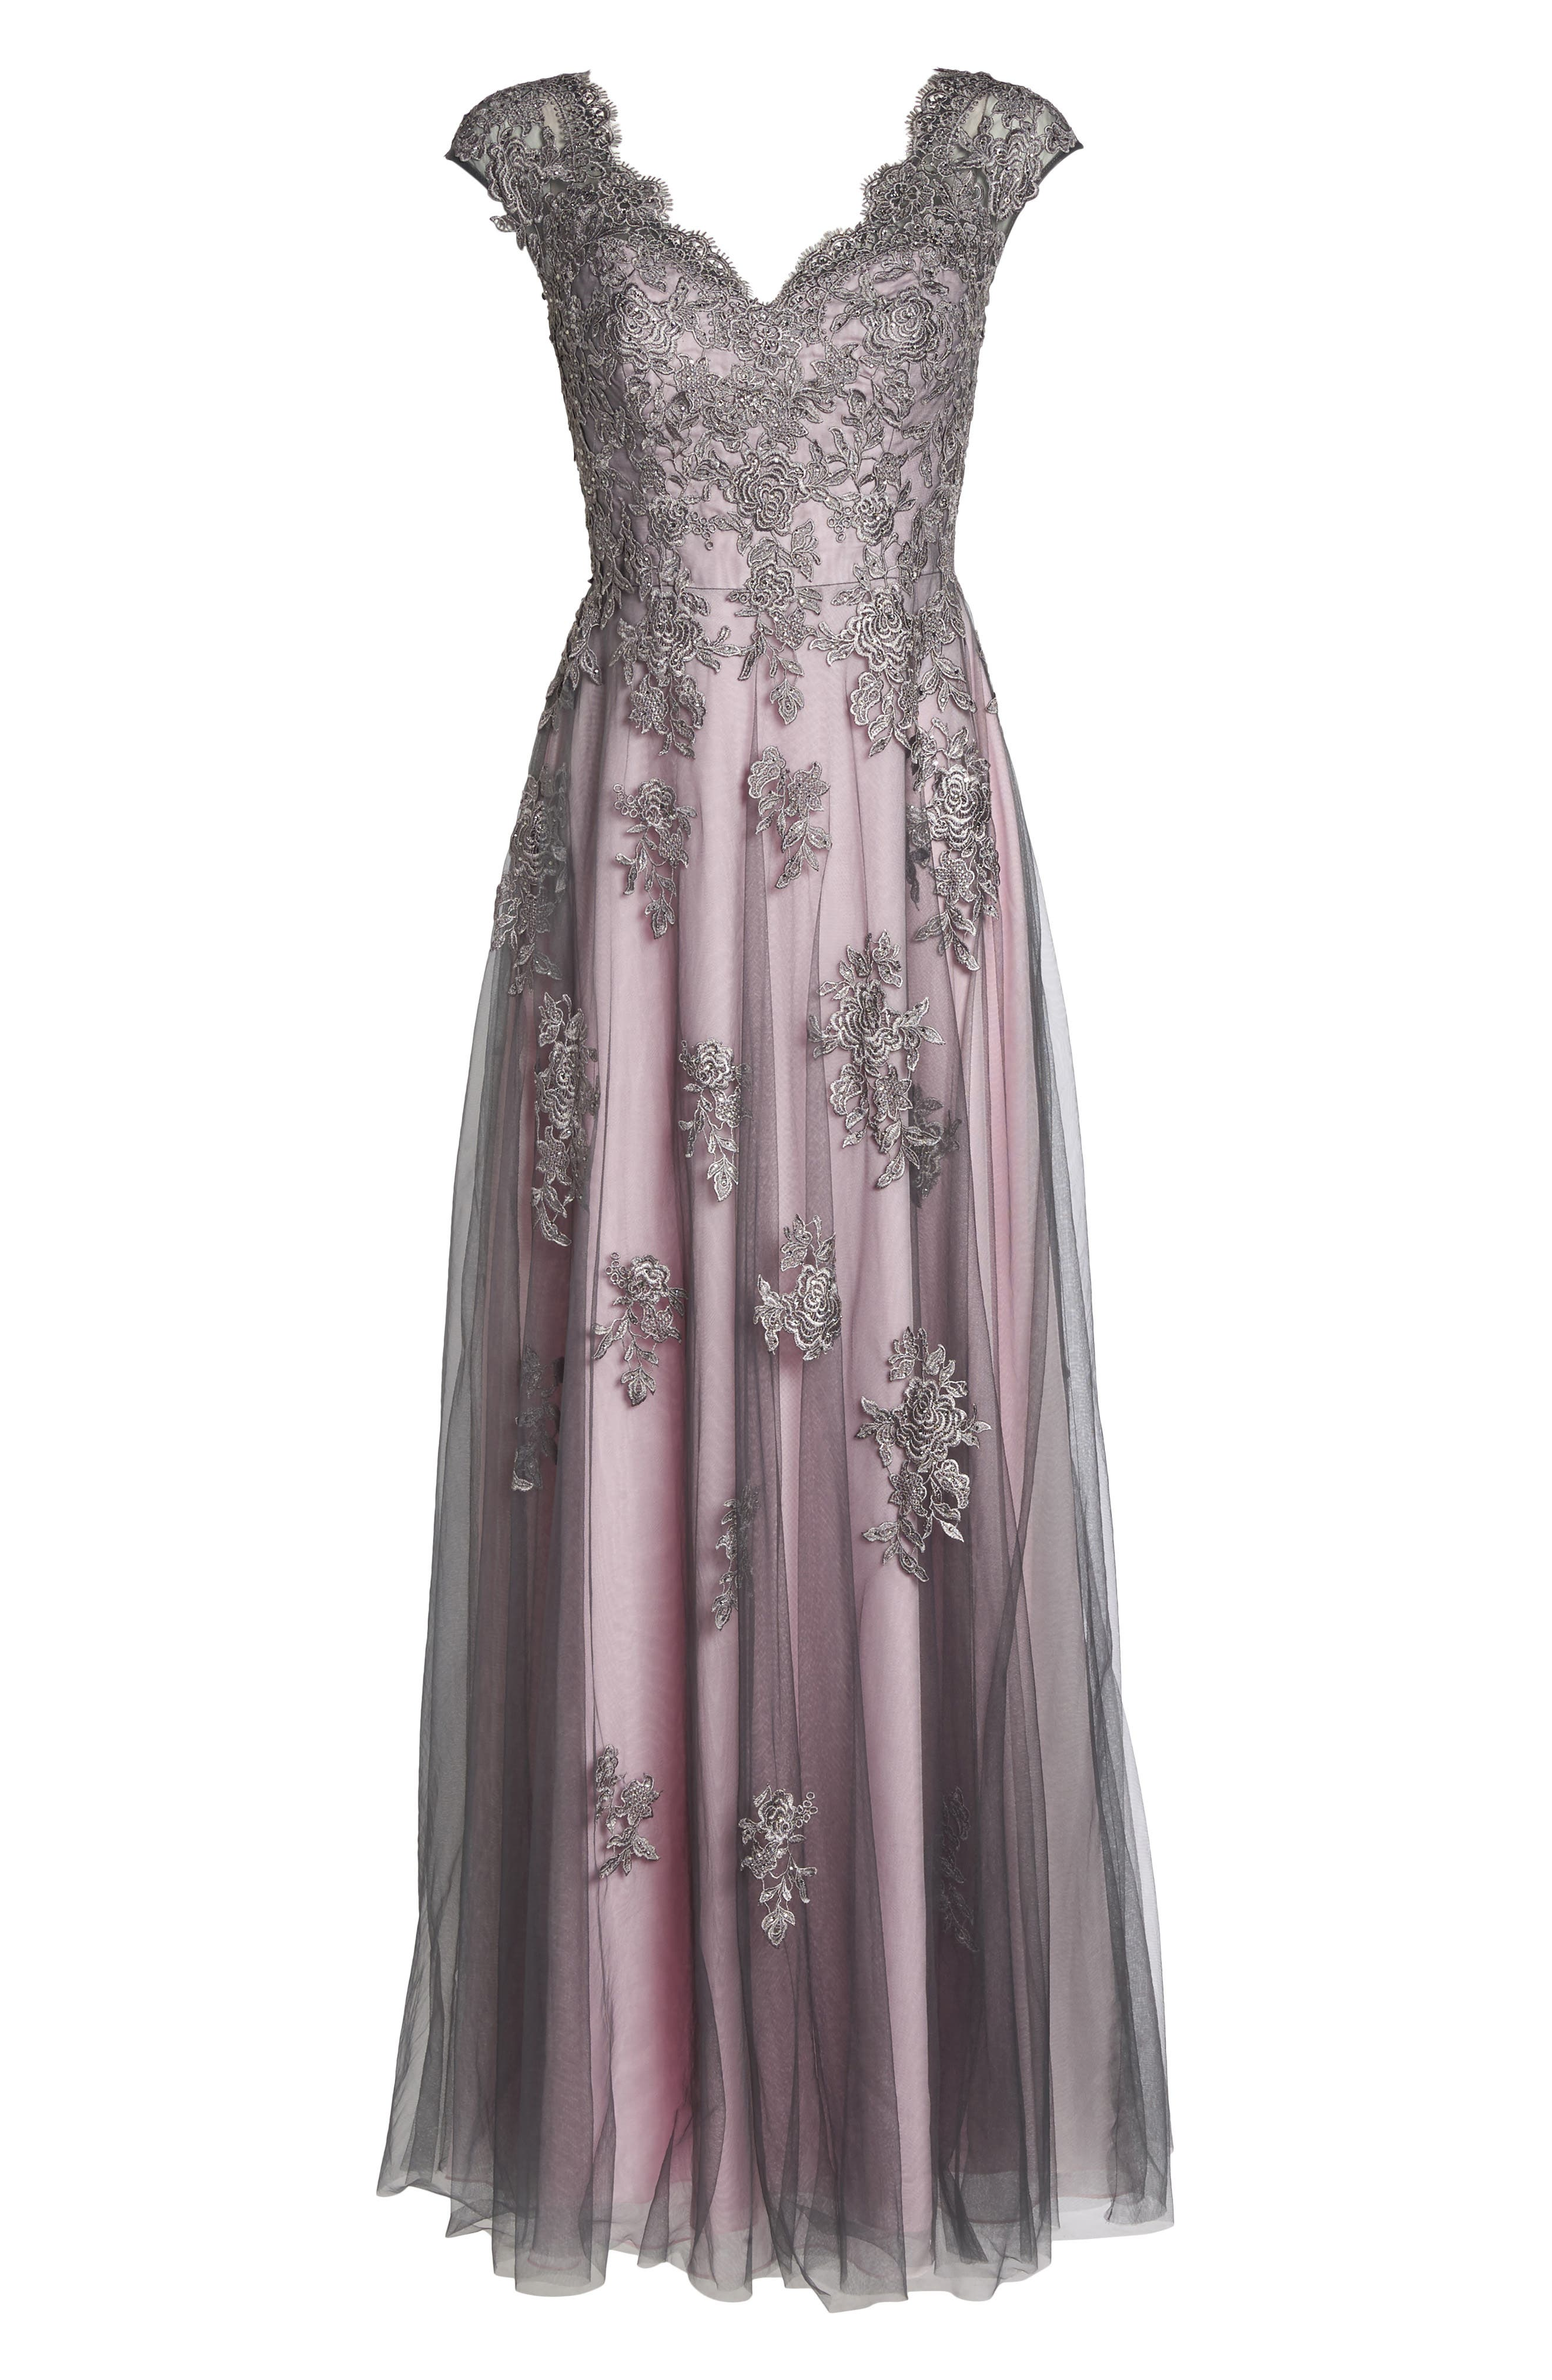 LA FEMME, Embellished Mesh A-Line Gown, Alternate thumbnail 6, color, PINK/ GRAY